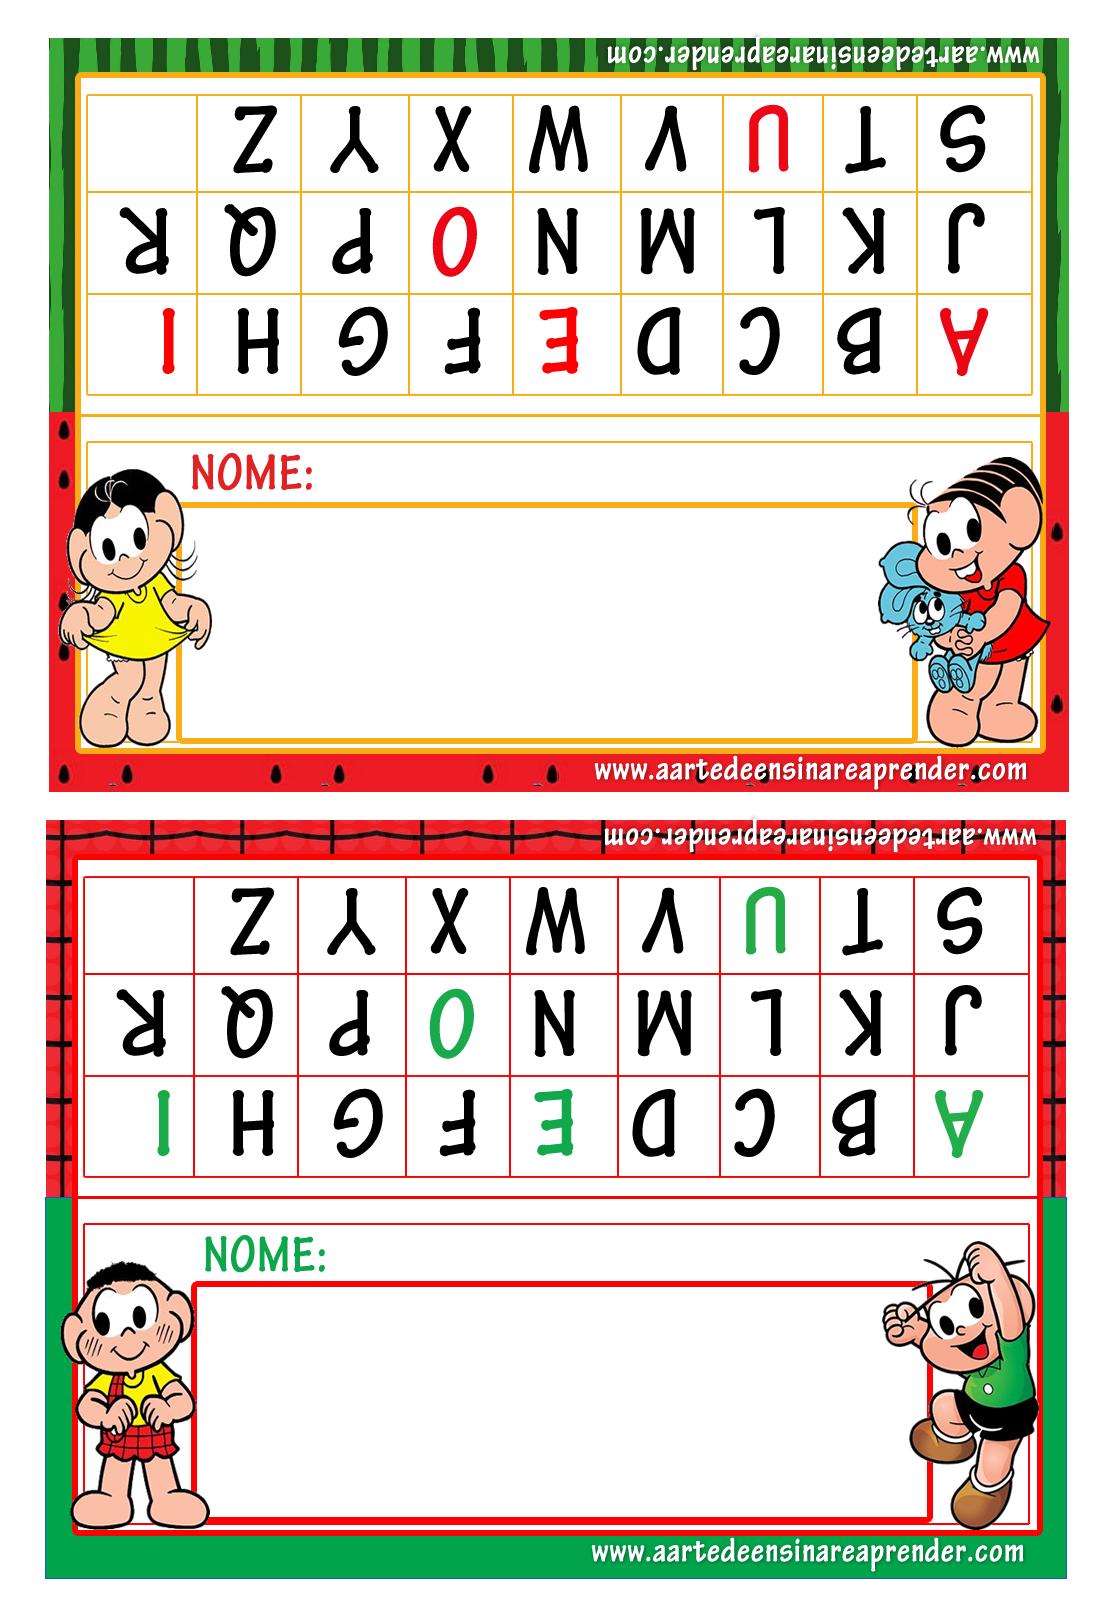 Suficiente Crachás de mesa - Turma da Mônica - A Arte de Ensinar e Aprender SH98